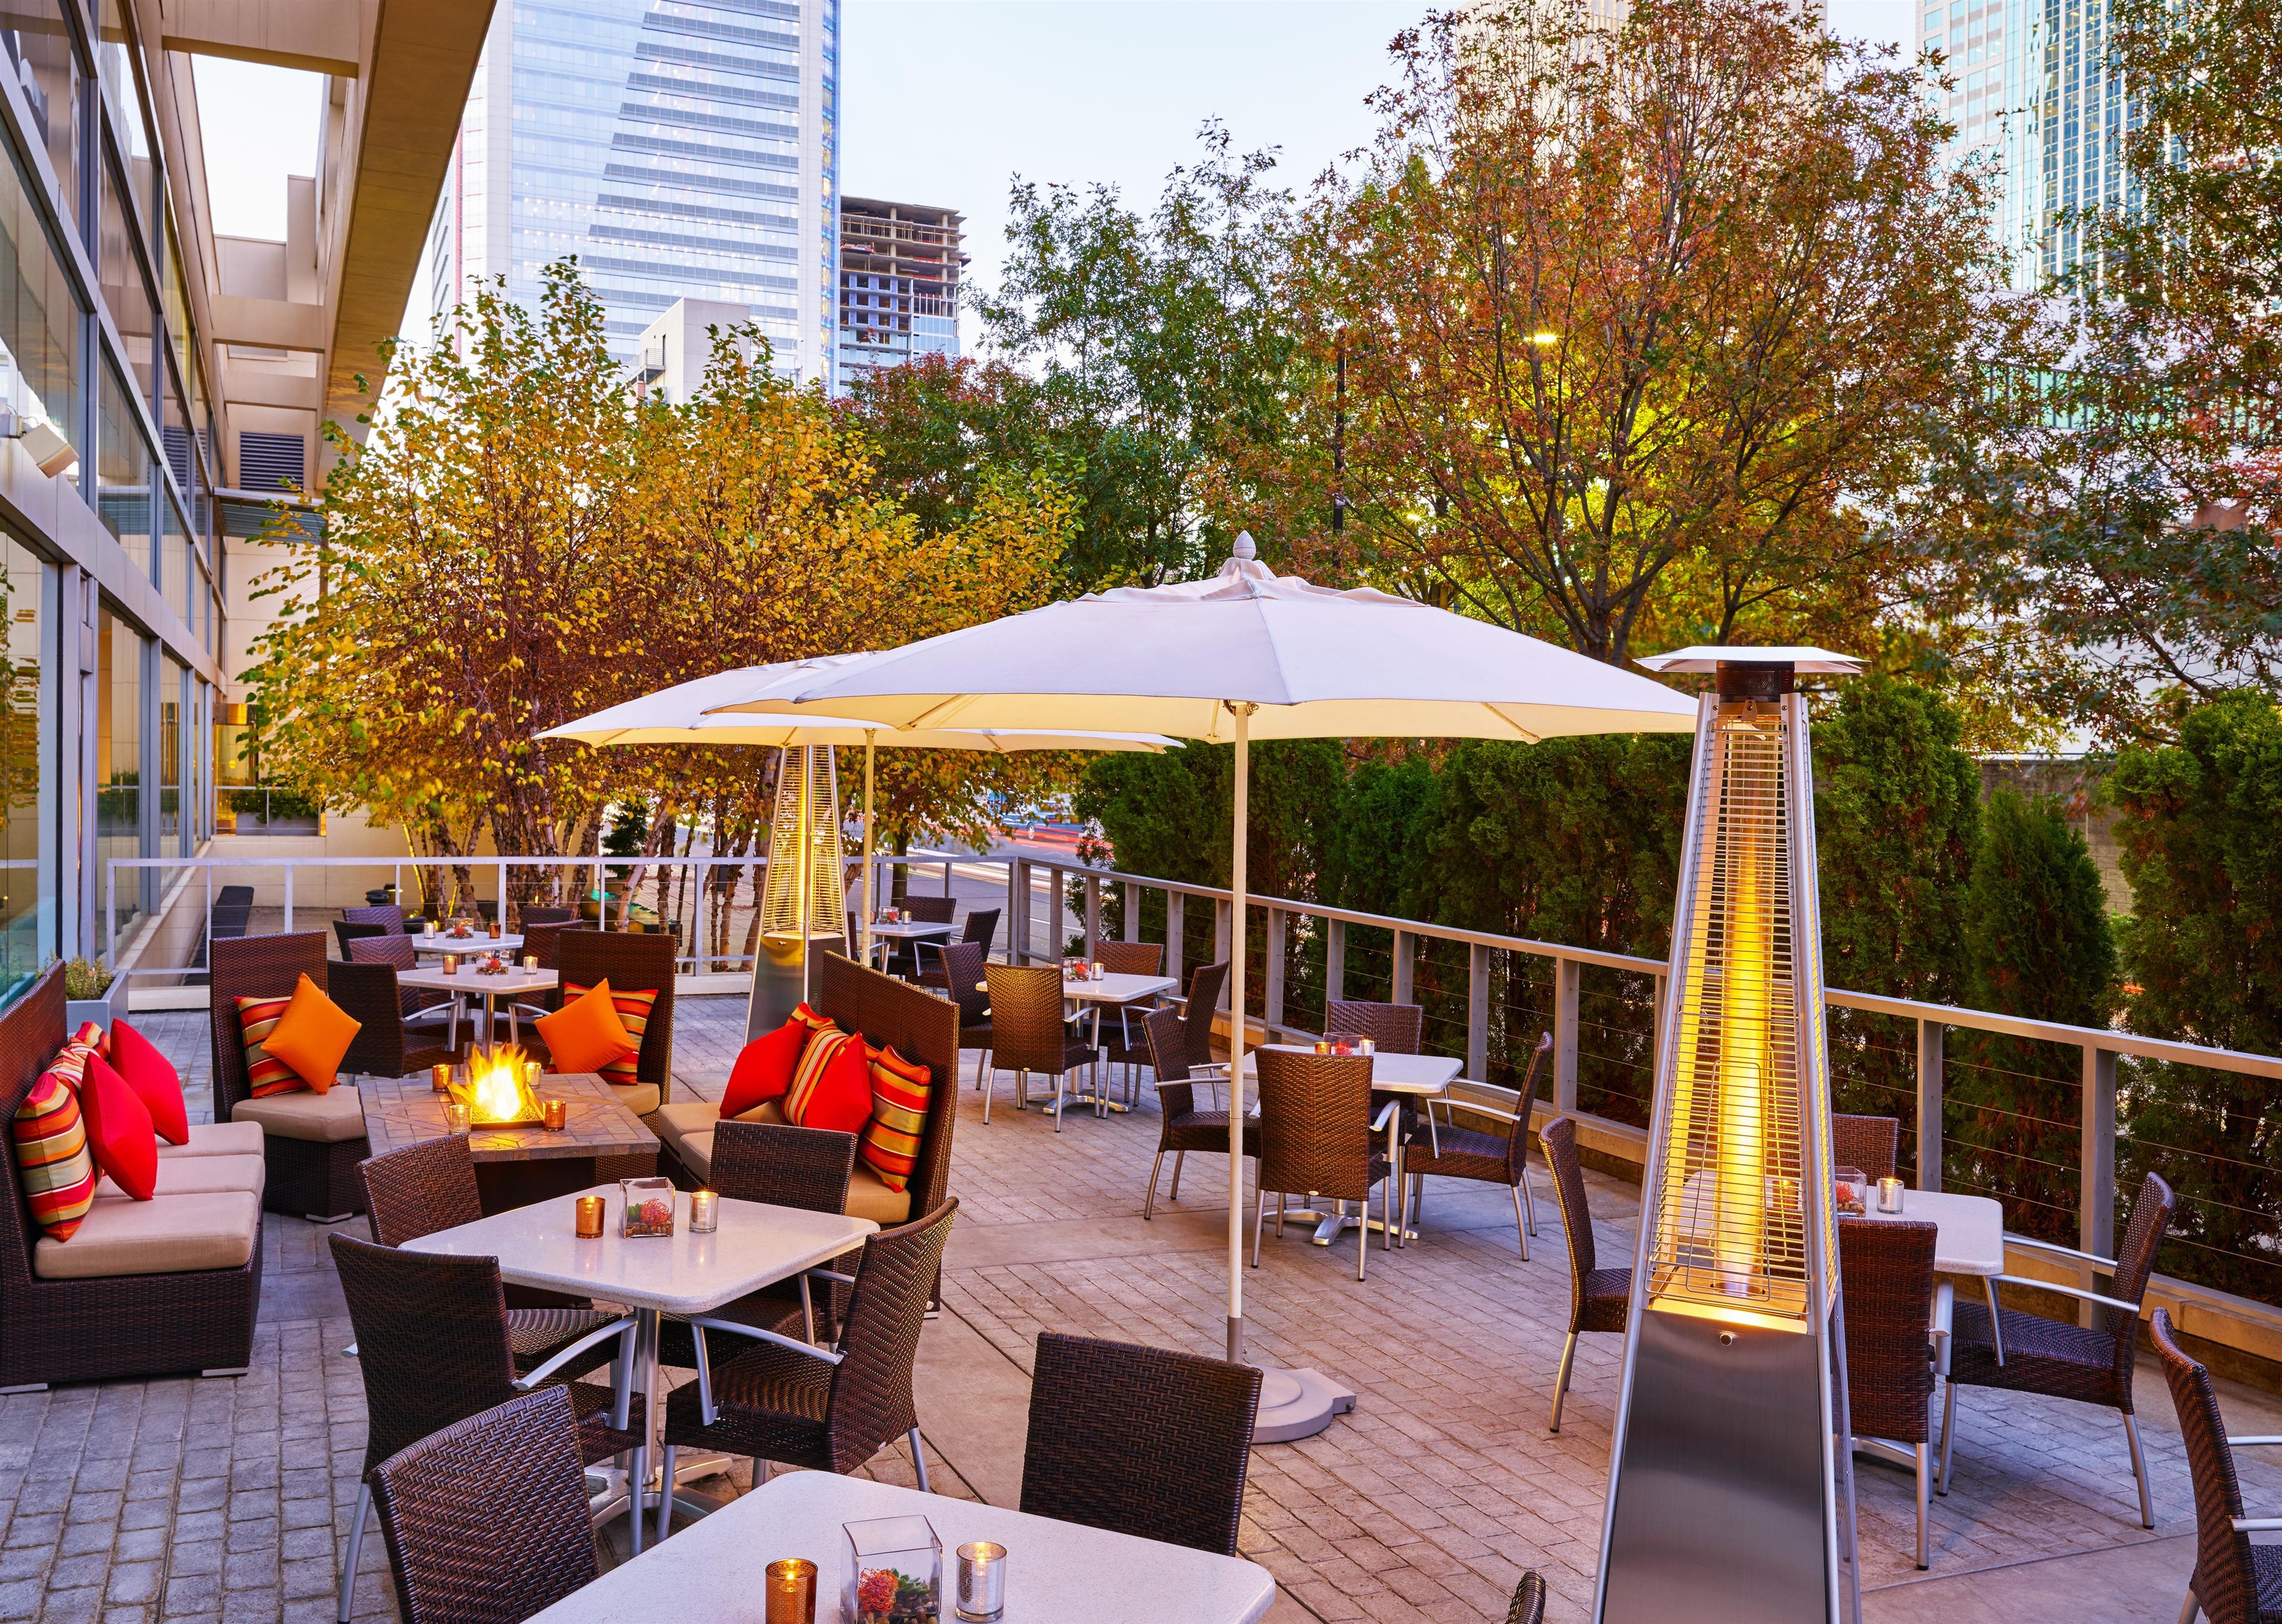 The westin charlotte charlotte nc company profile for Terrace restaurant charlotte